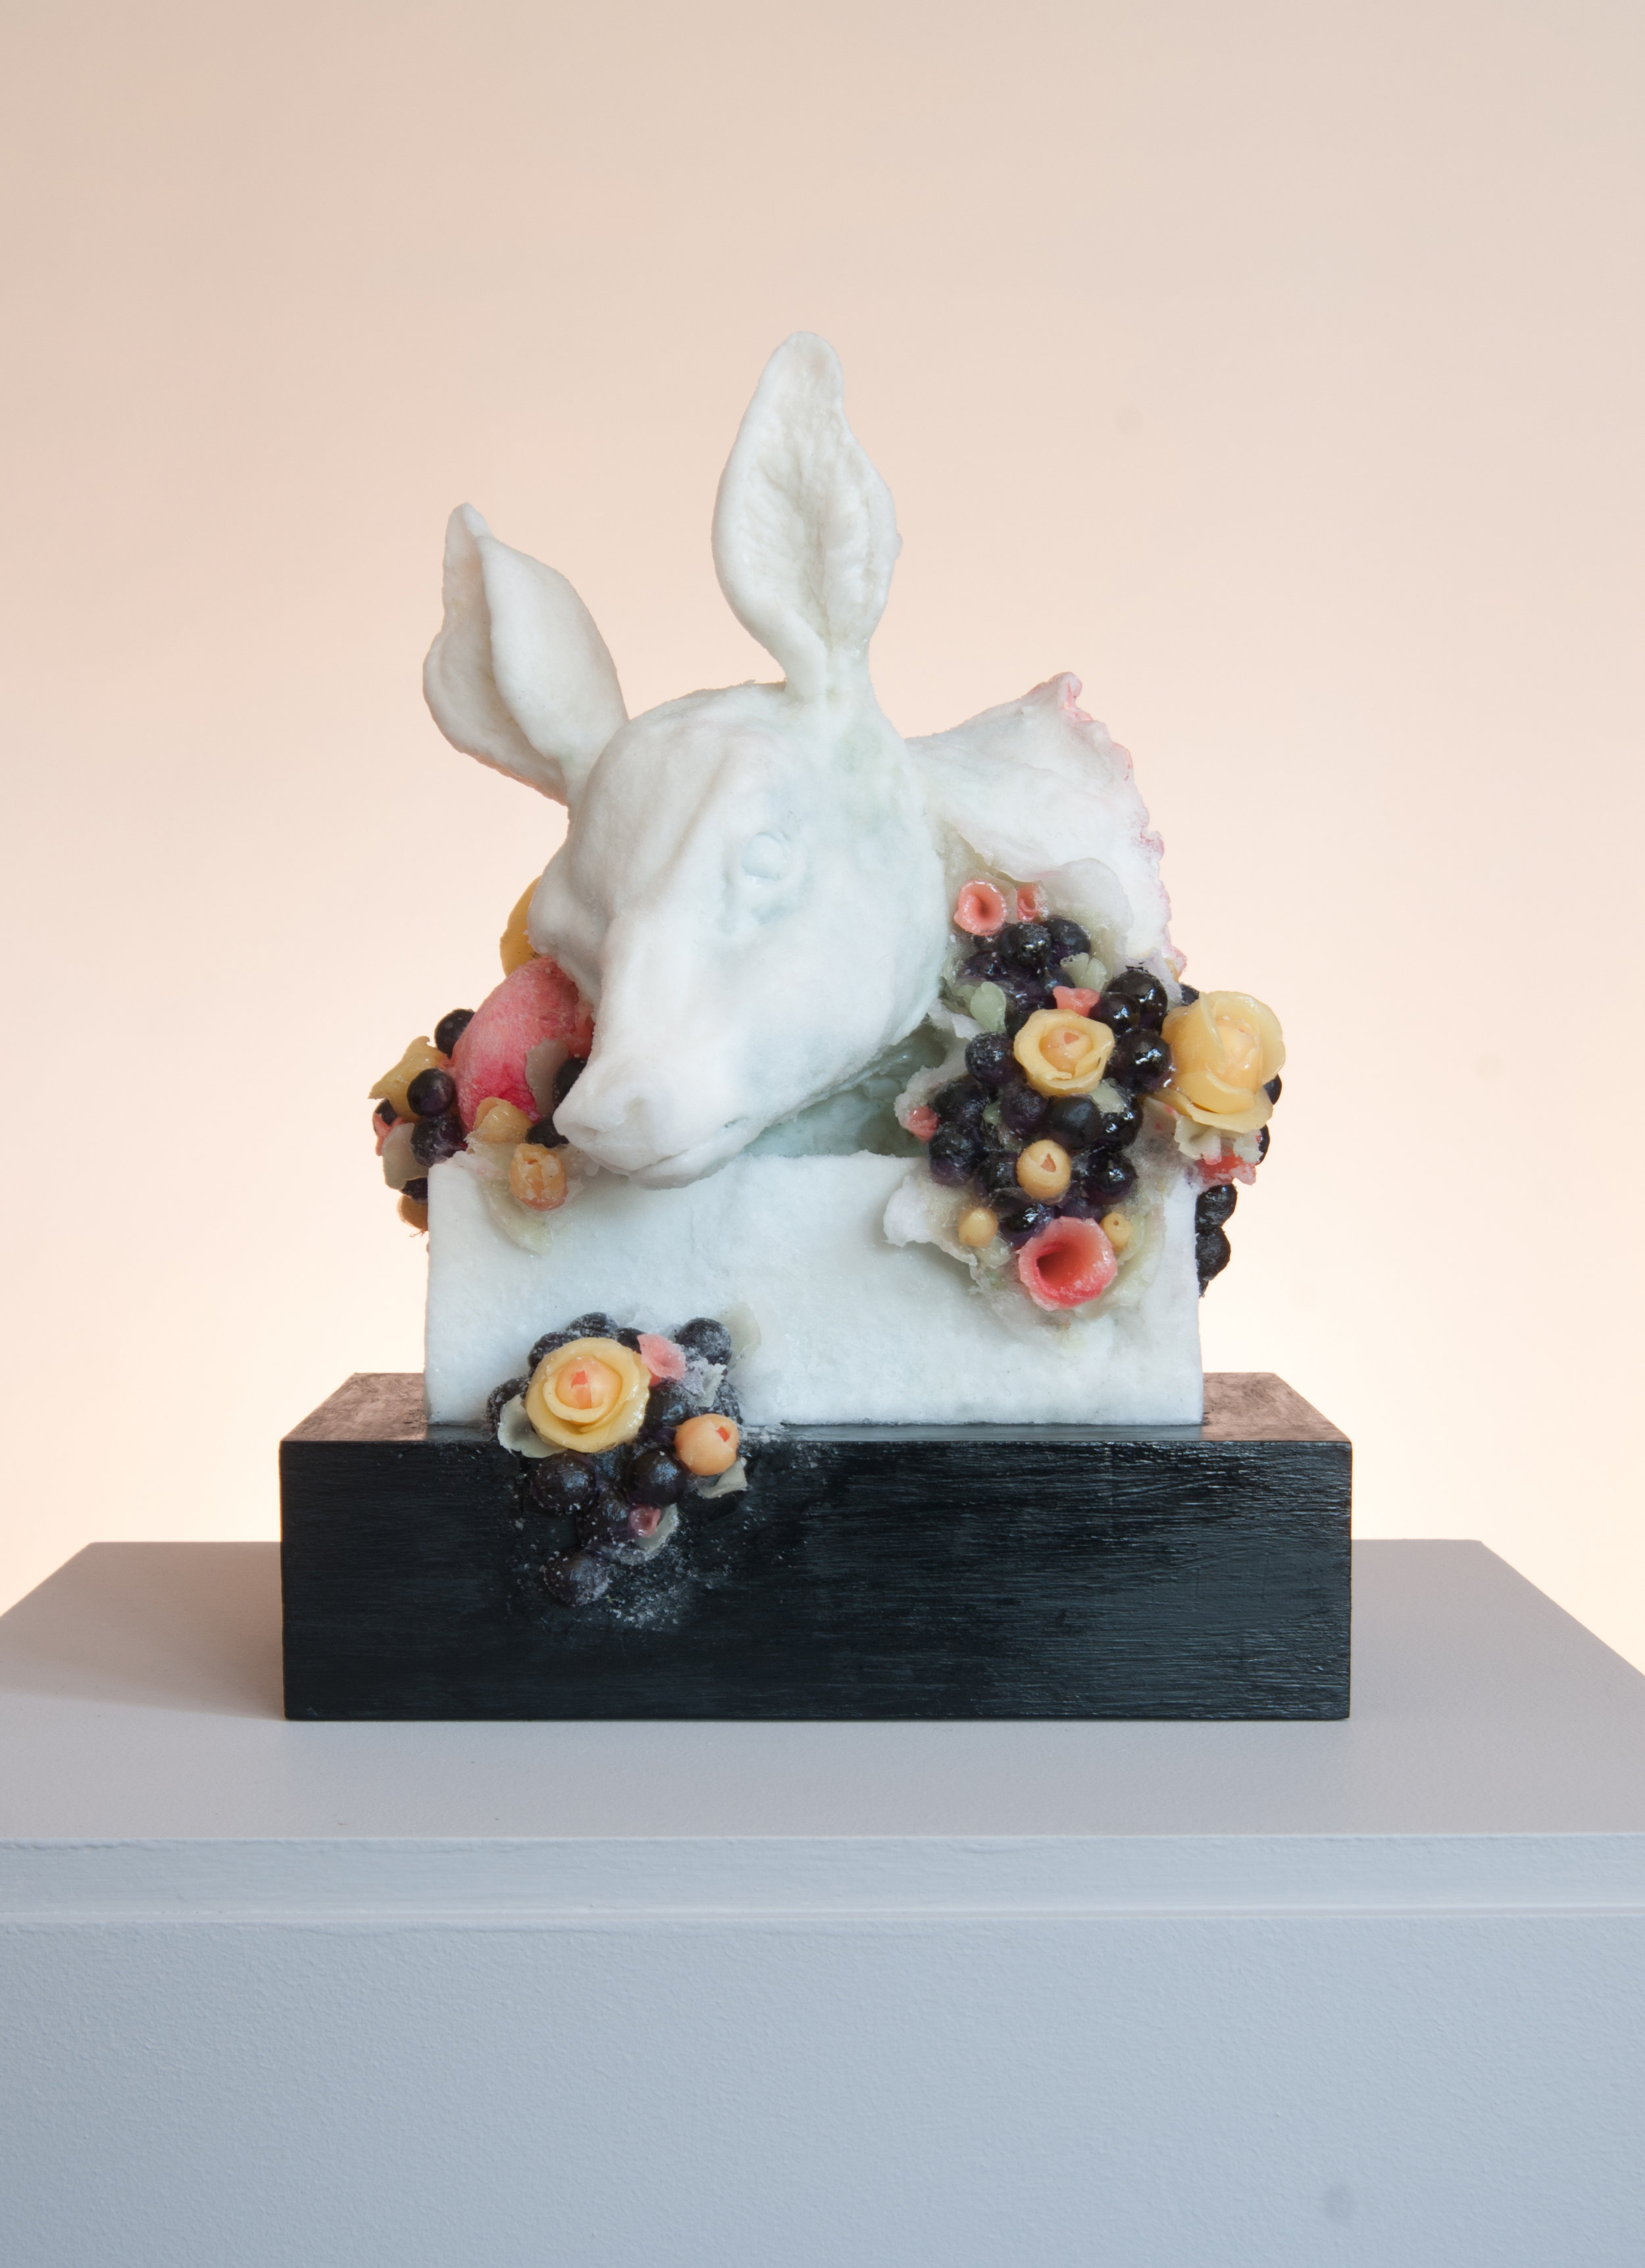 Sweet Slice, 2017, Polyester resin, wax, wood, mixed media, 37 x 27 x 25cm, £4,000